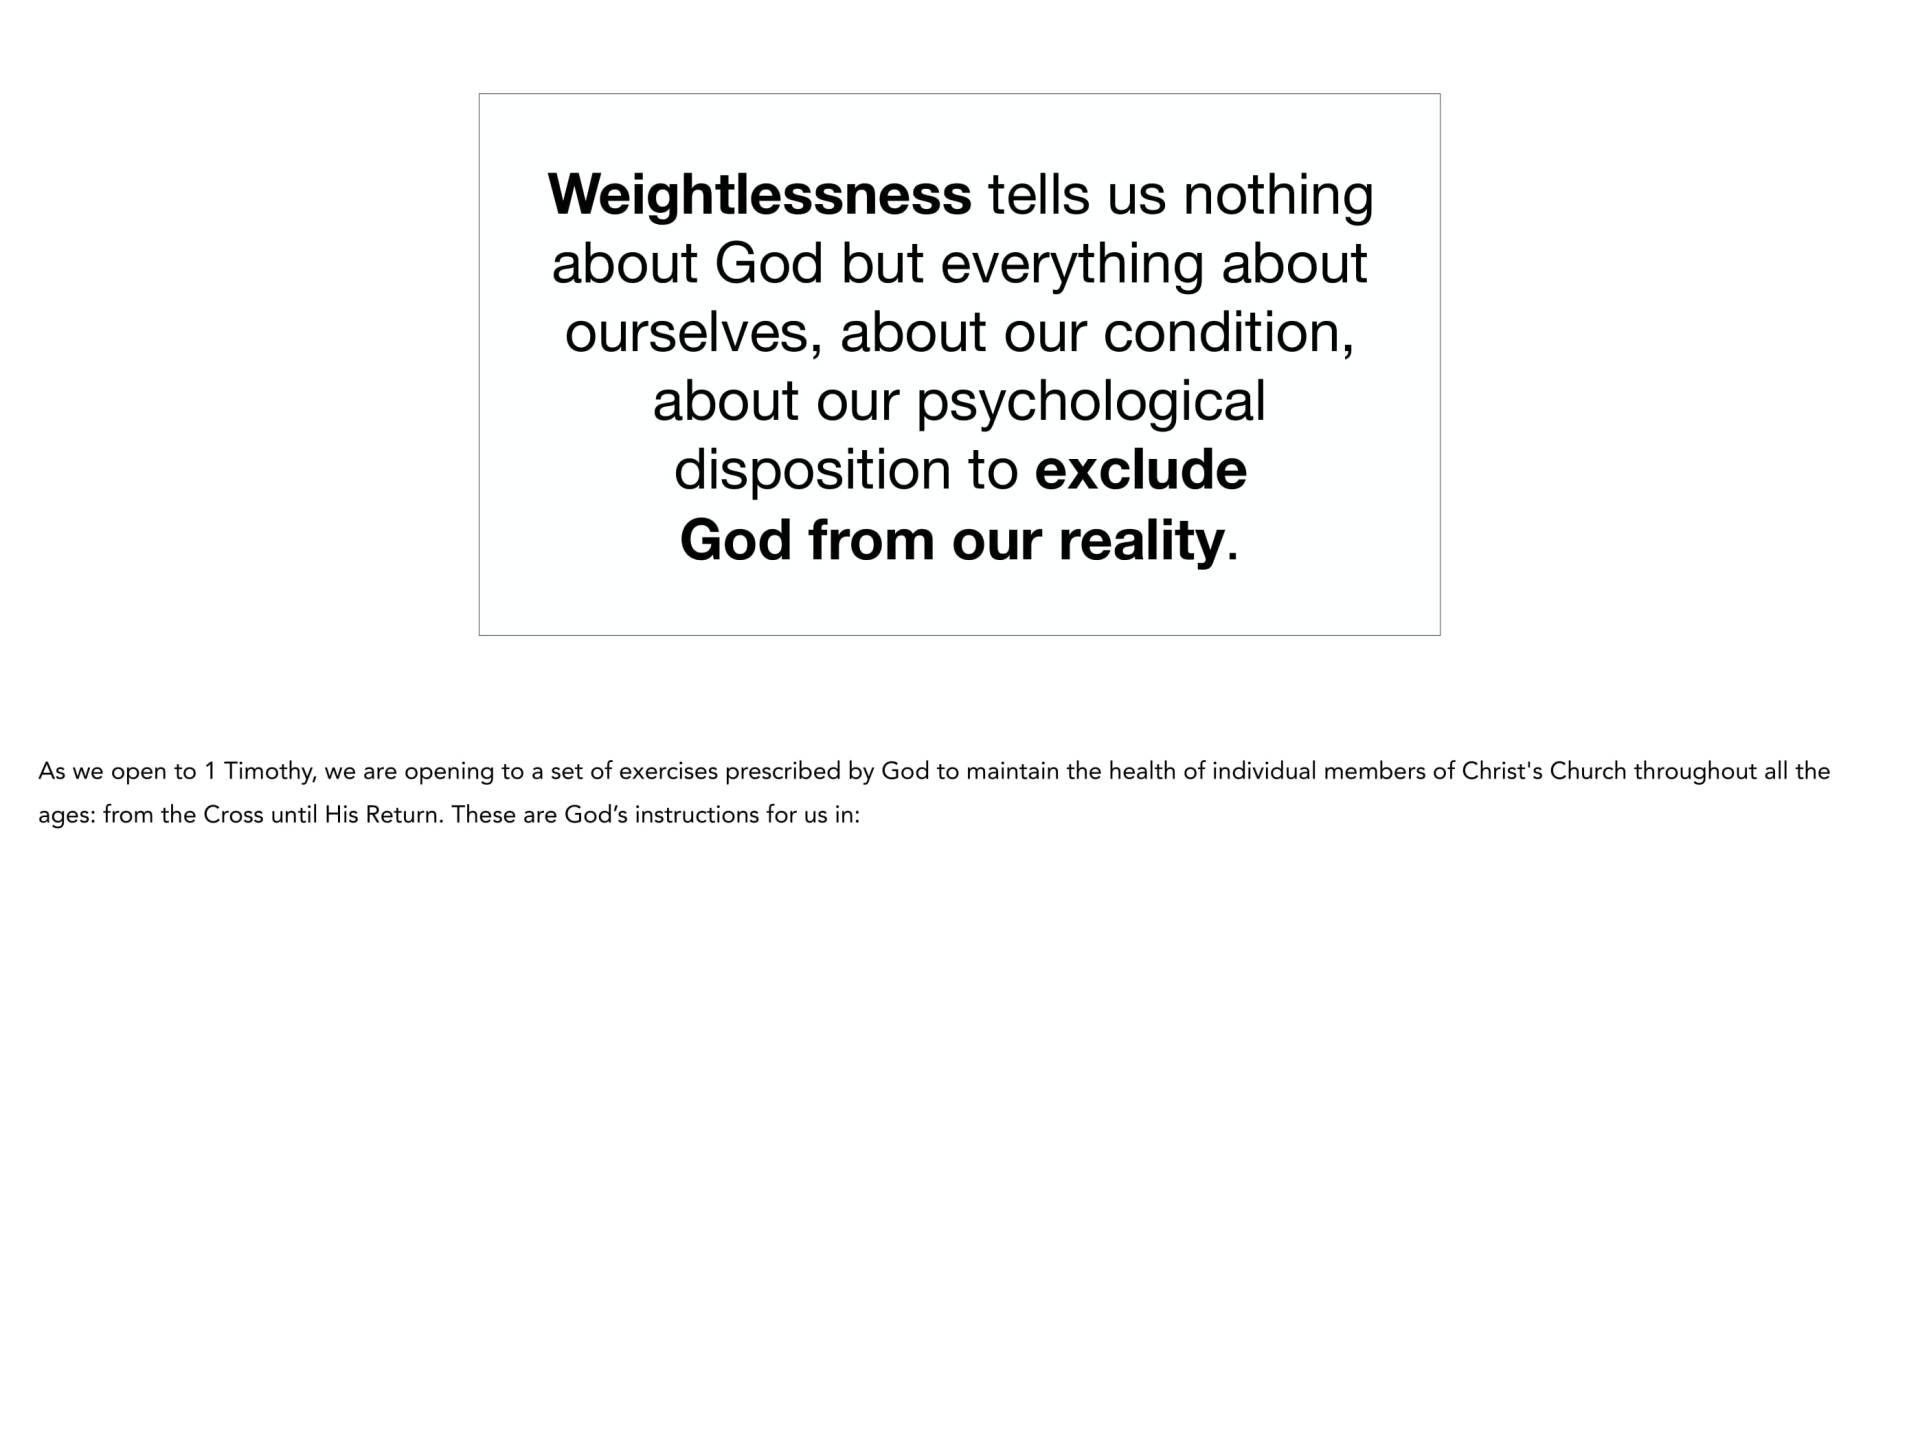 LGI-02 - Men & Husbands Beware Of Weightlessness-19